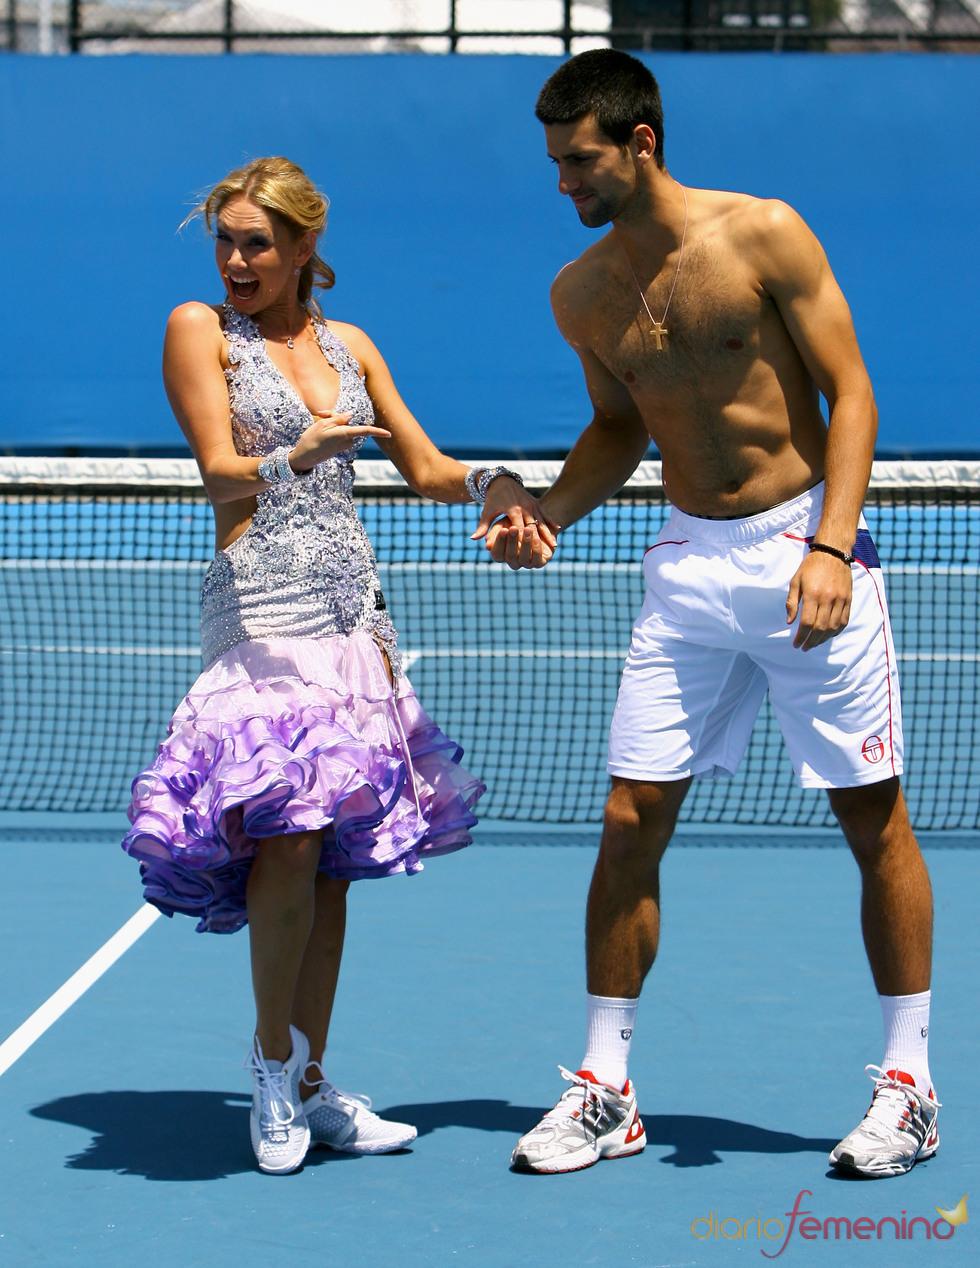 Novak Djokovic se anima a bailar en pleno partido